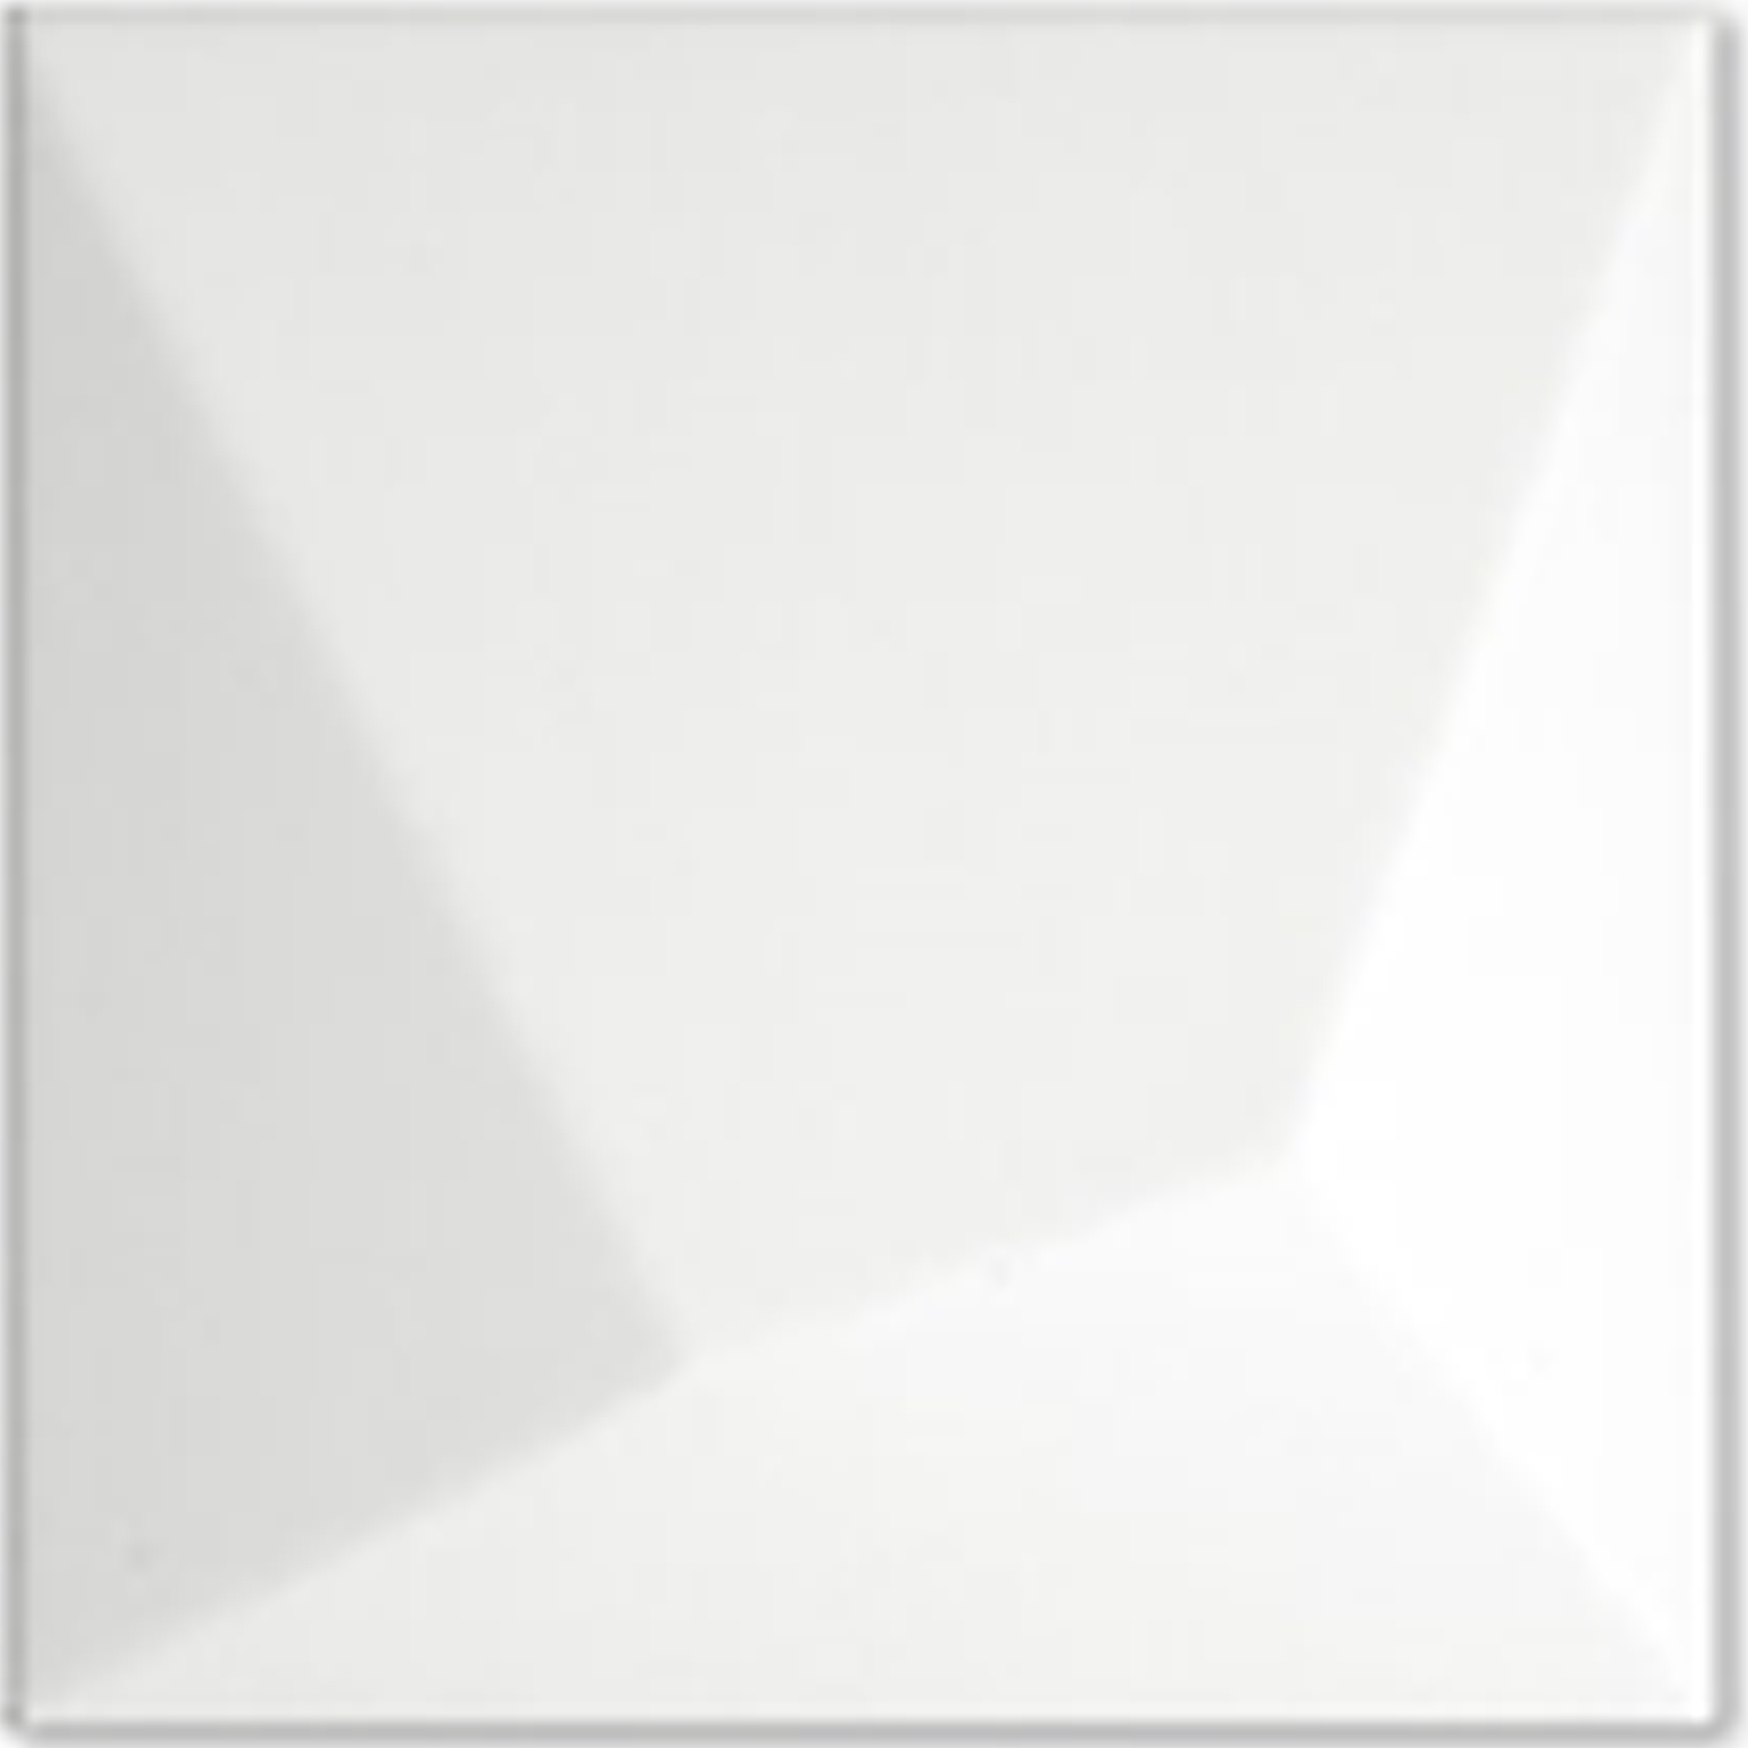 Optic Blanco 14.8x14.8 cm